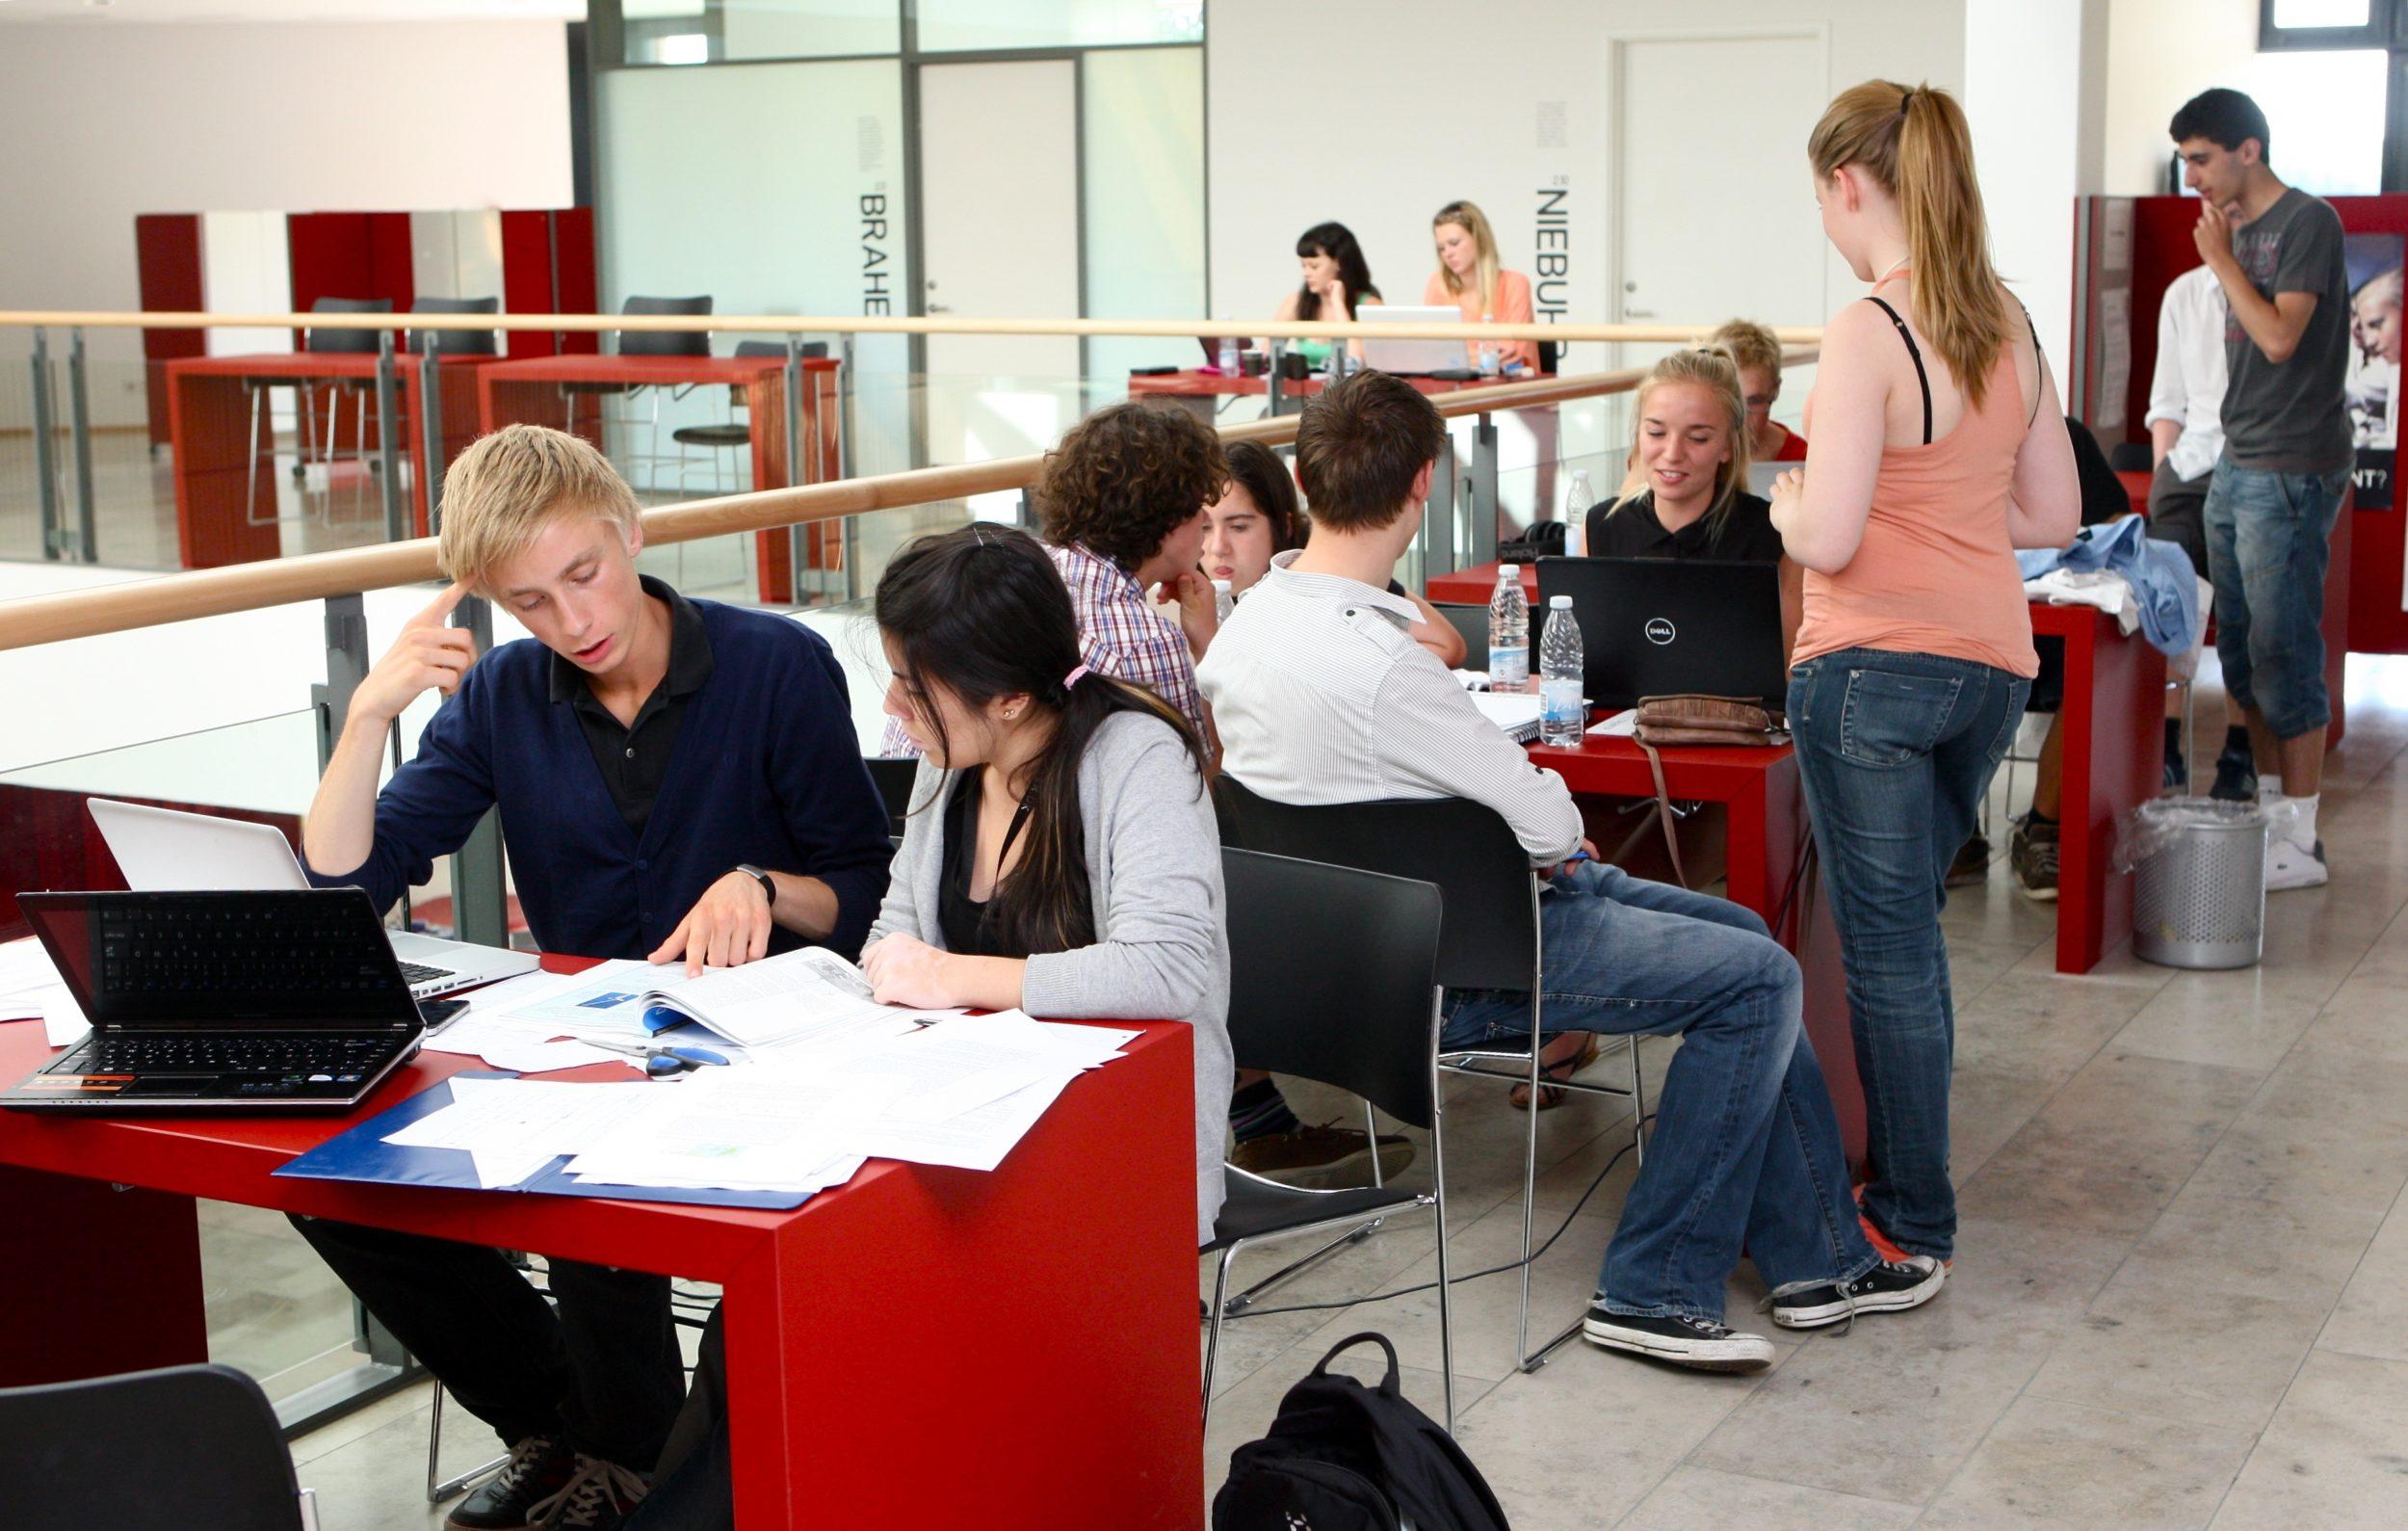 Frederik i talentcamp